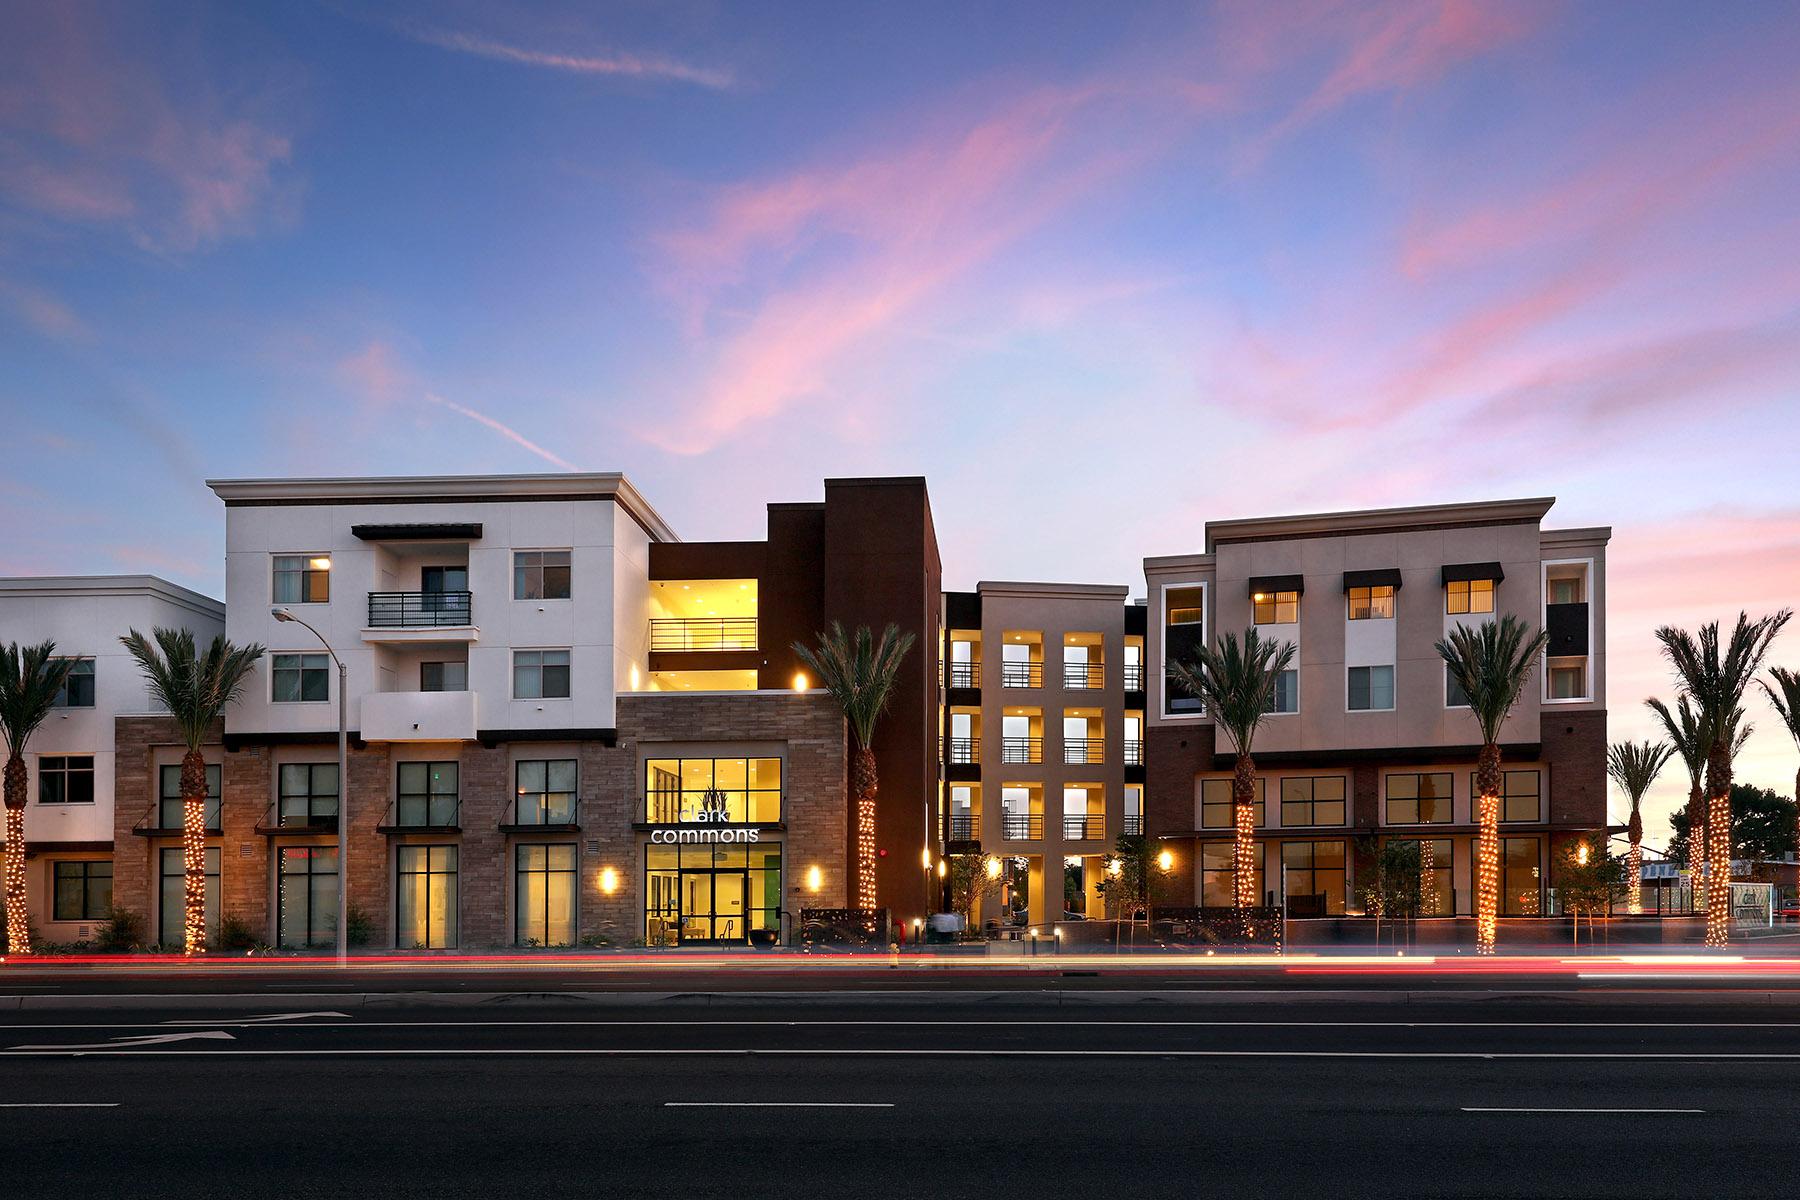 Clark Commons, street view, dusk, affordable/workforce housing (Photo: Jamboree by Juantallo.com)